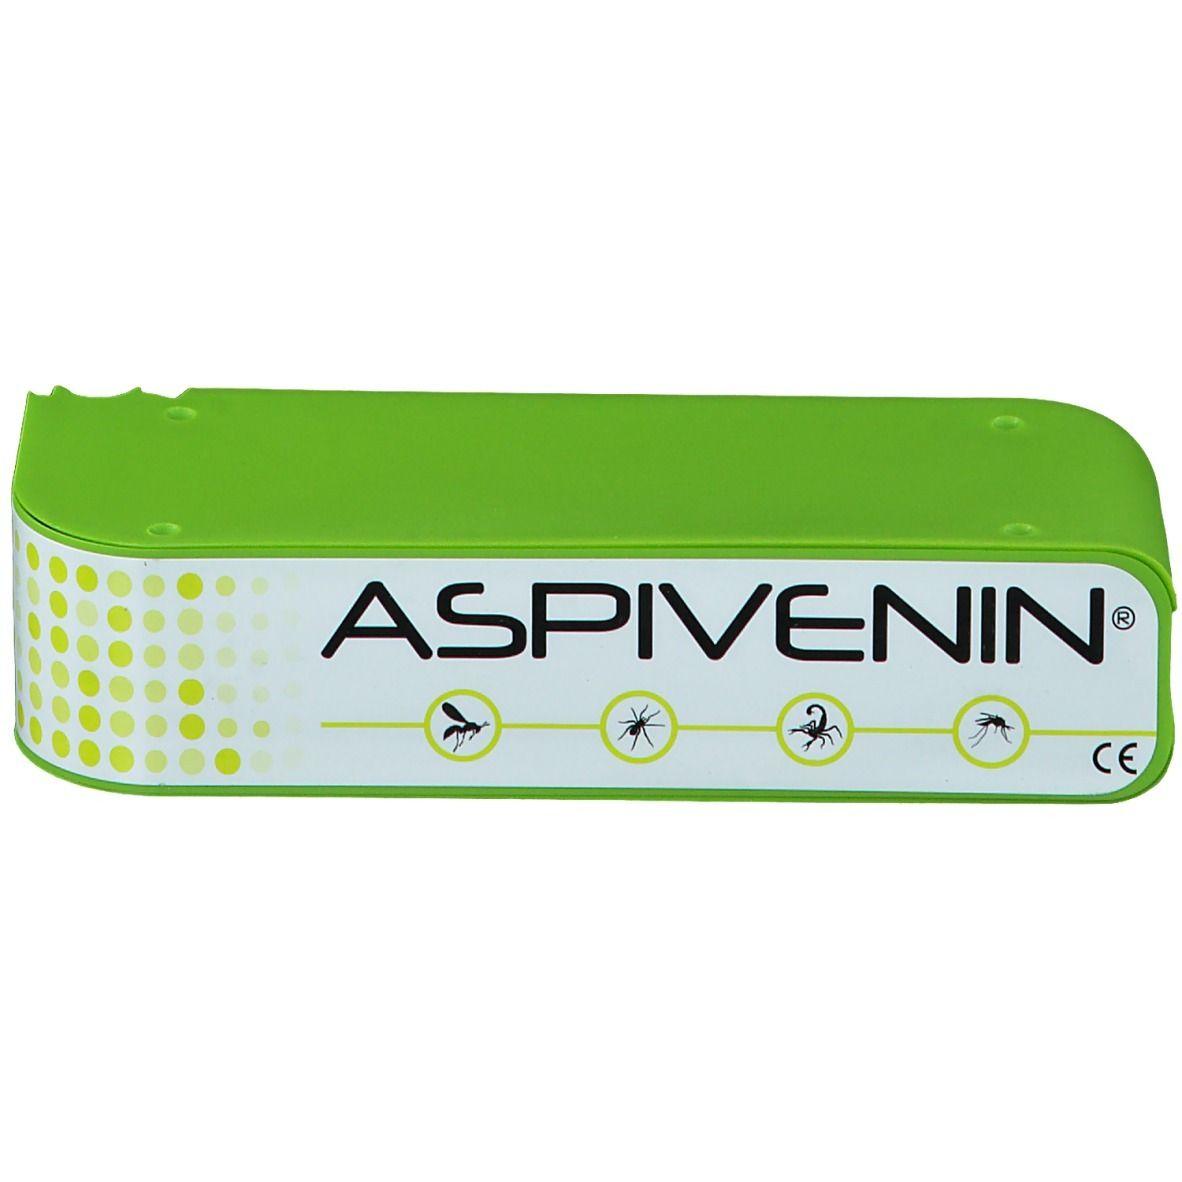 Image of Aspivenin®